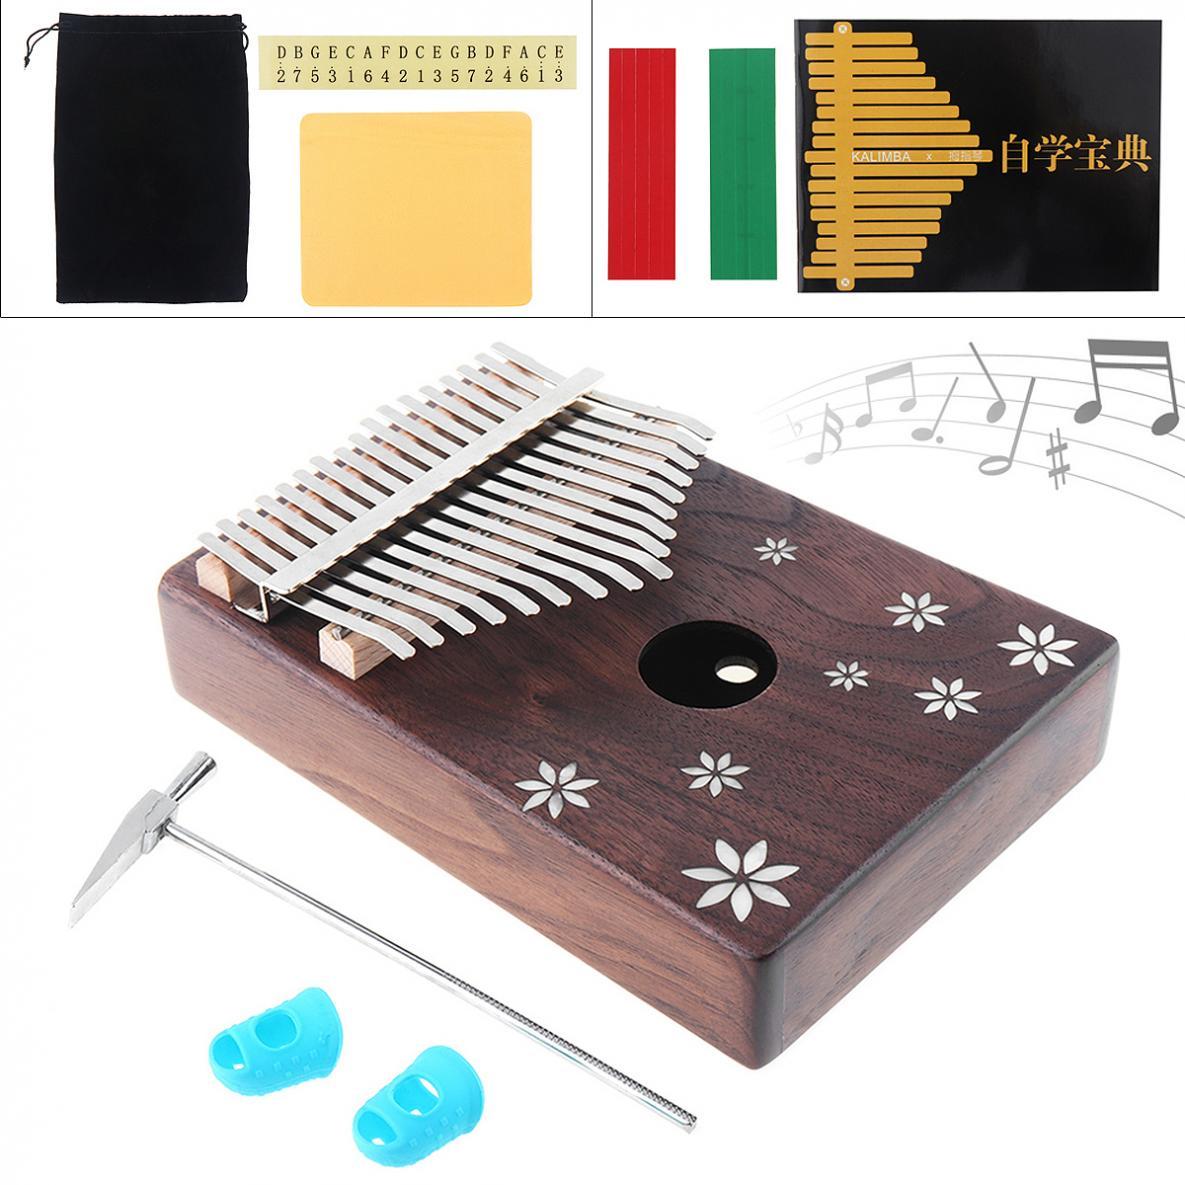 17 Key Mini Kalimba Acacia Wood Thumb Piano with Shell Inlay Seven leaf Flower Mbira Natural Keyboard Instrument